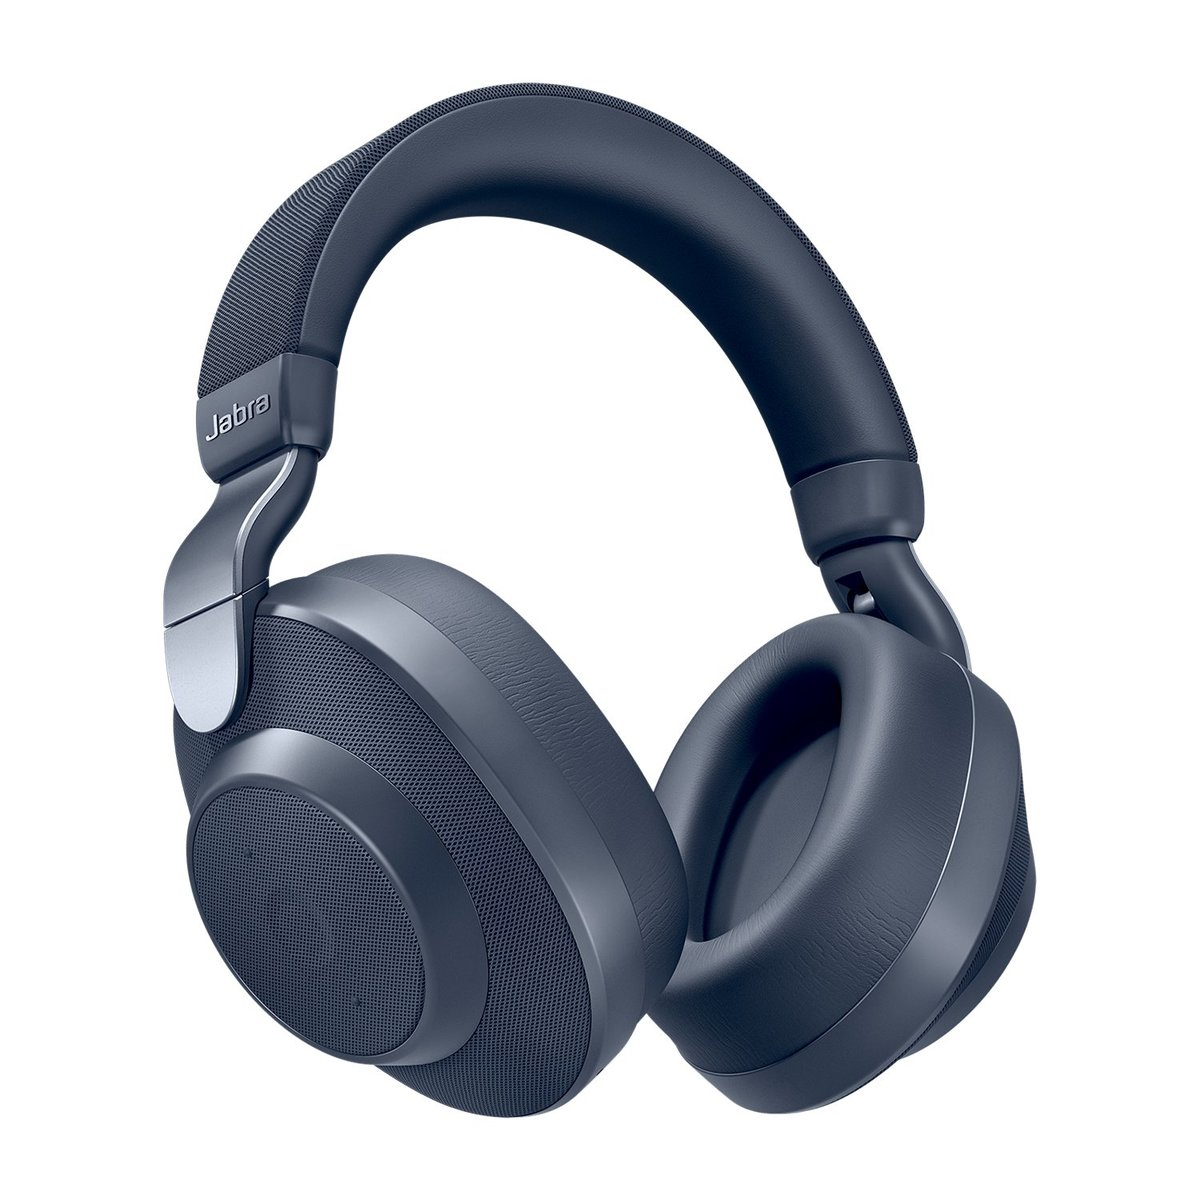 Elite 85h 主動降噪頭戴耳機[海軍藍色]